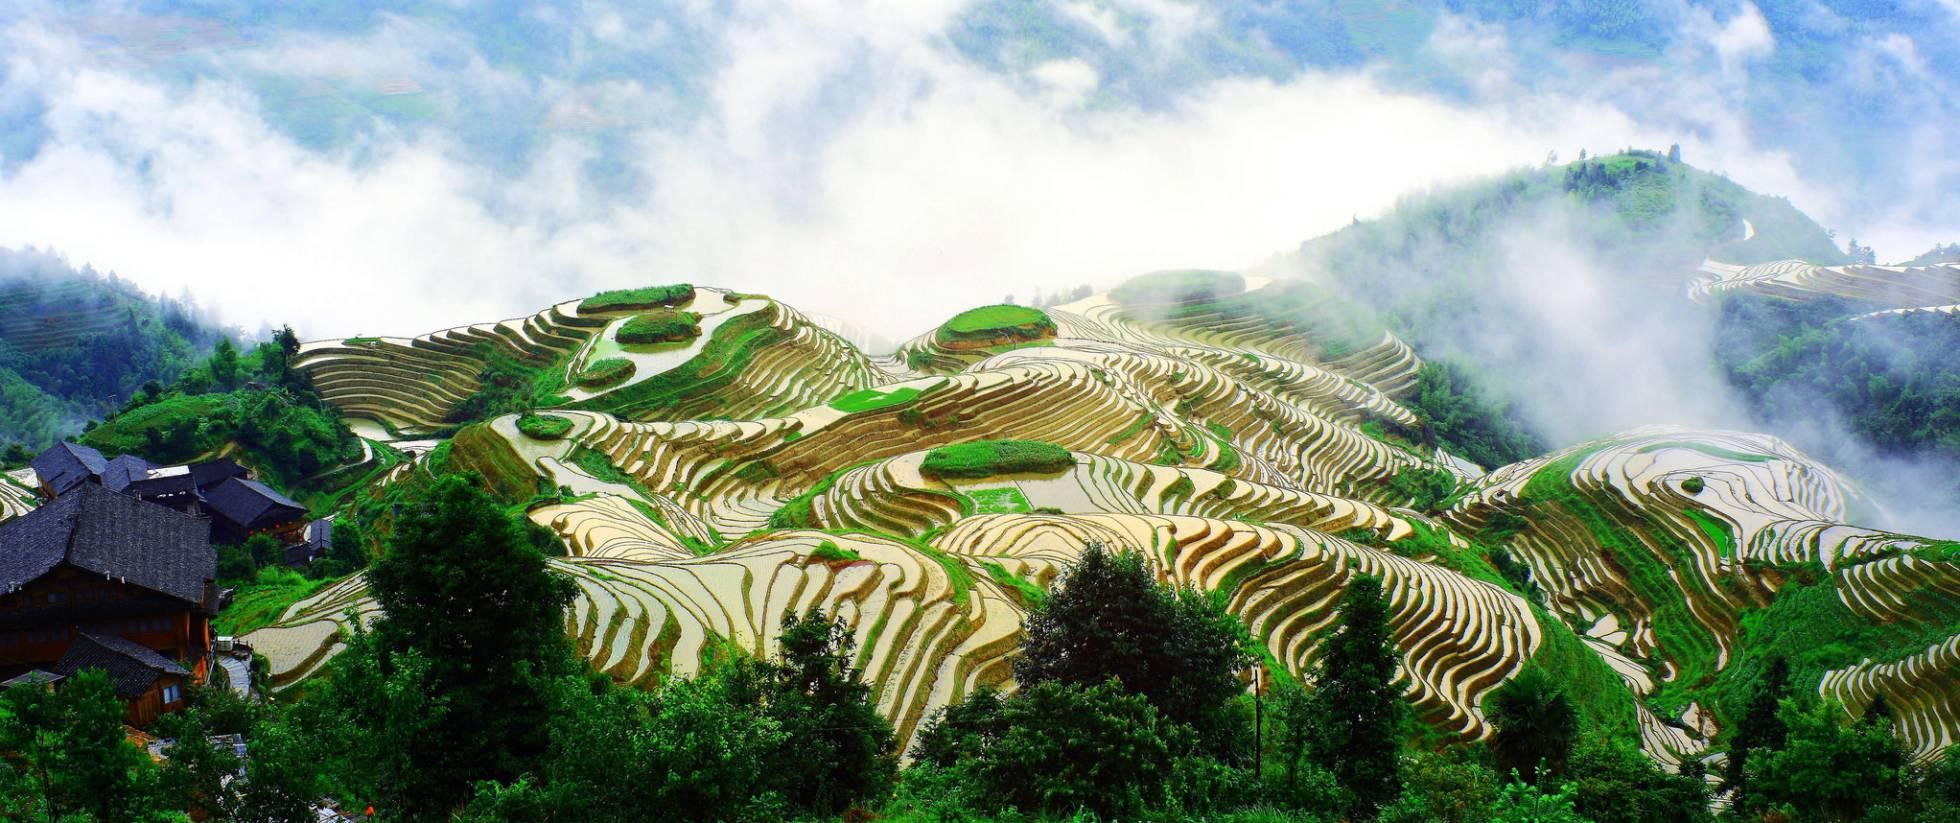 Terrazas de arroz en el condado de Longsheng (China).